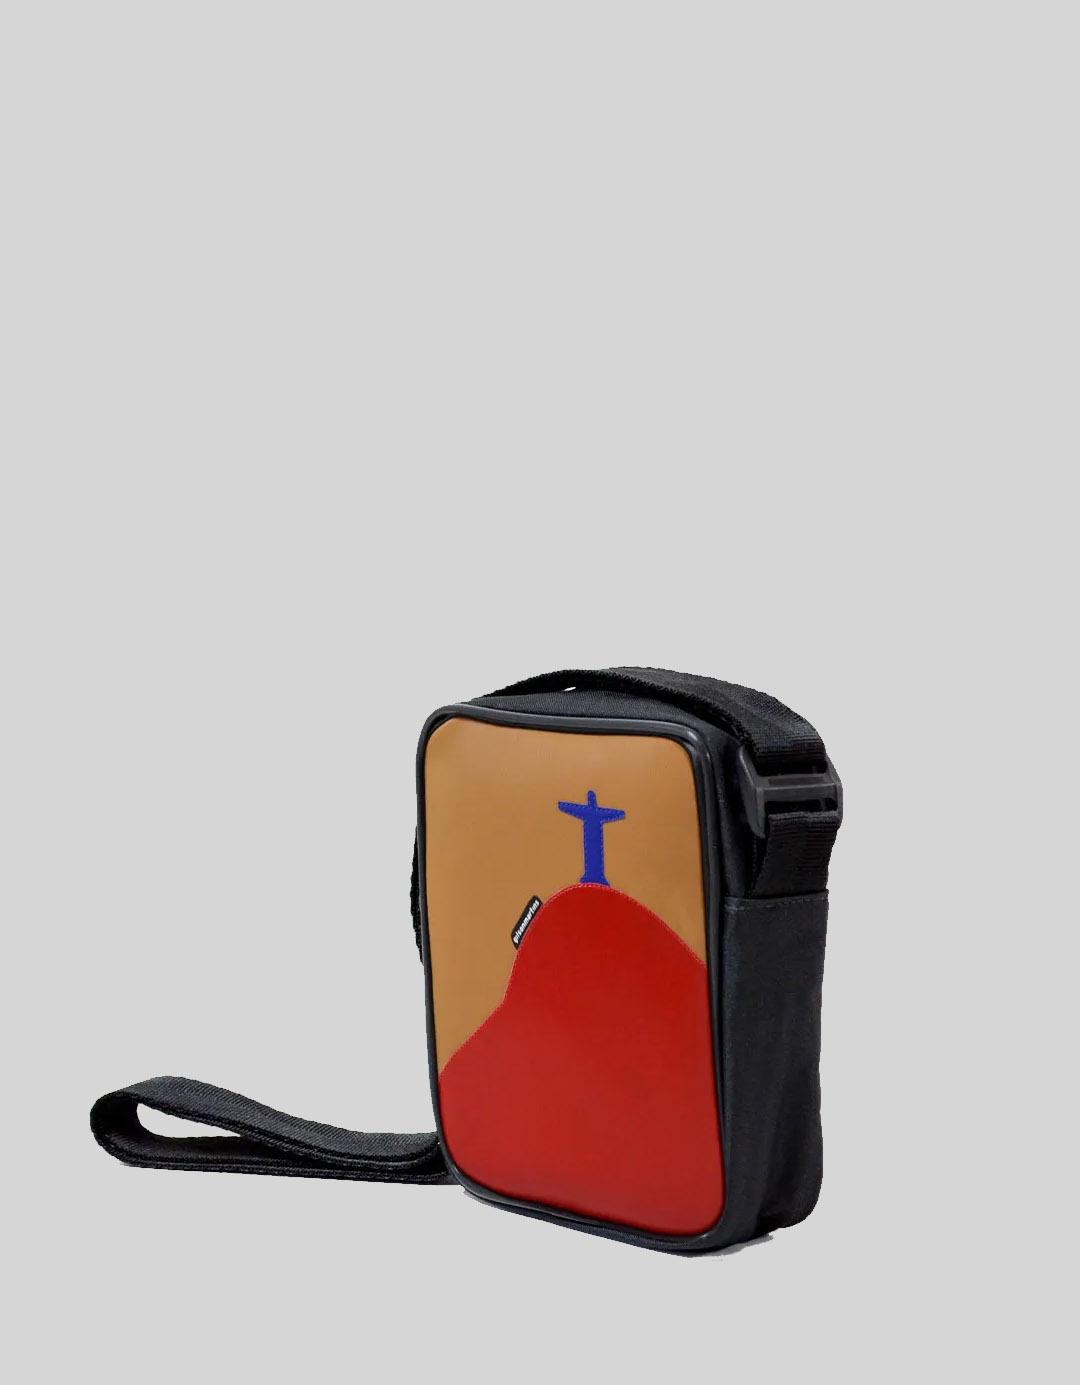 Bolsa Transversal Cross Bag Preta Marrom Ben